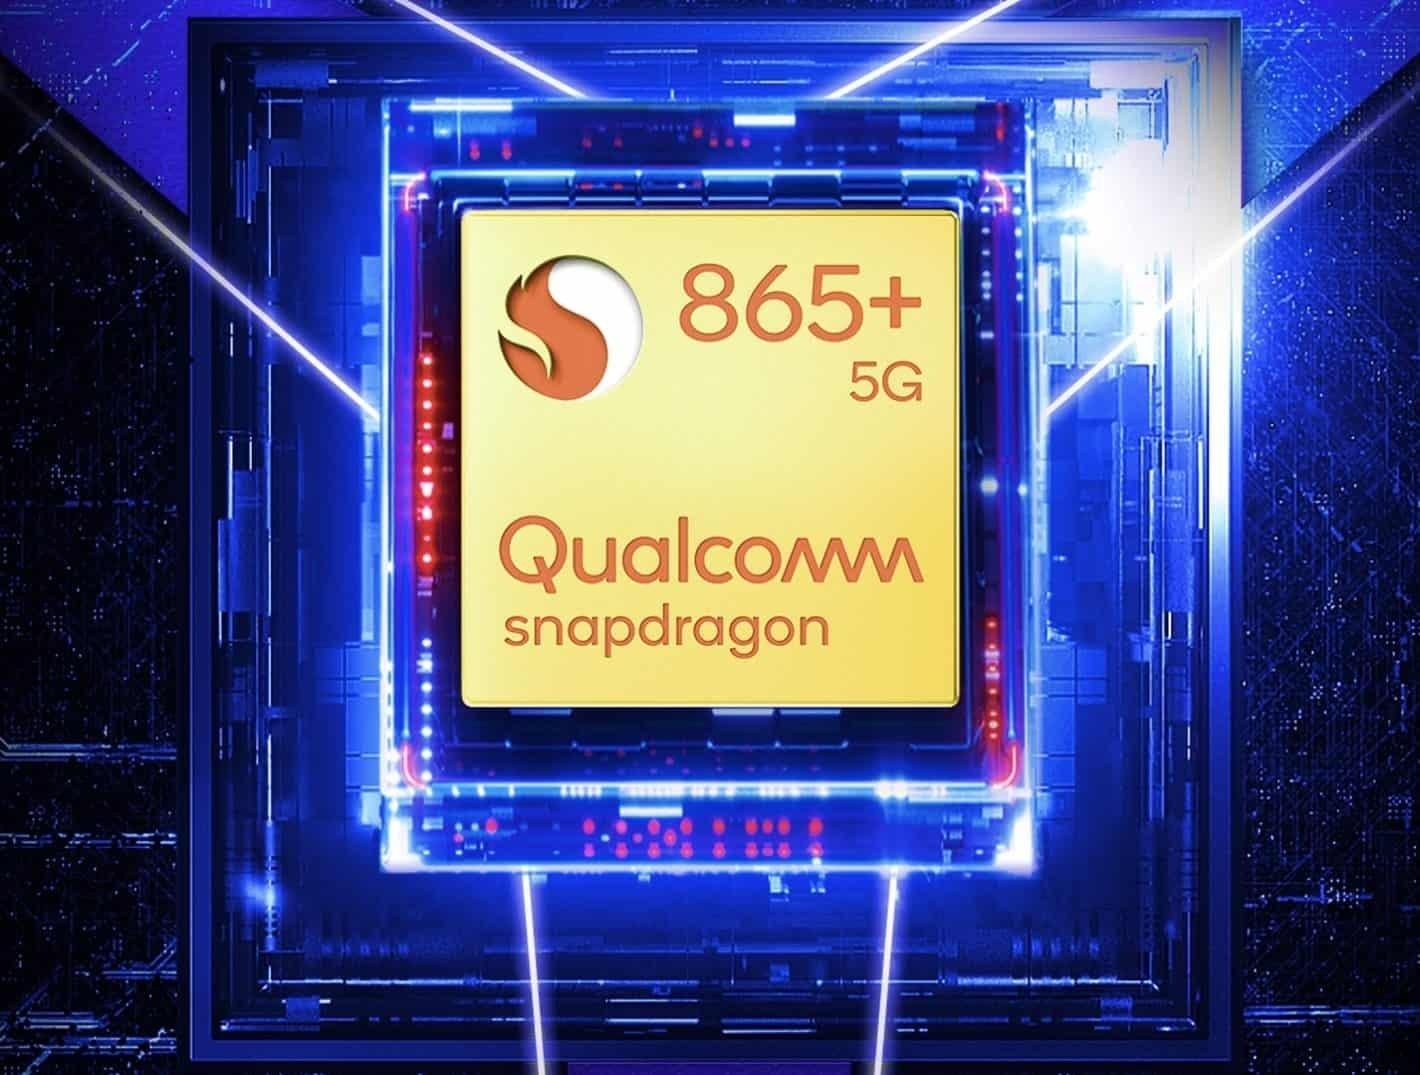 Galaxy Z Fold 2 Snapdragon 865